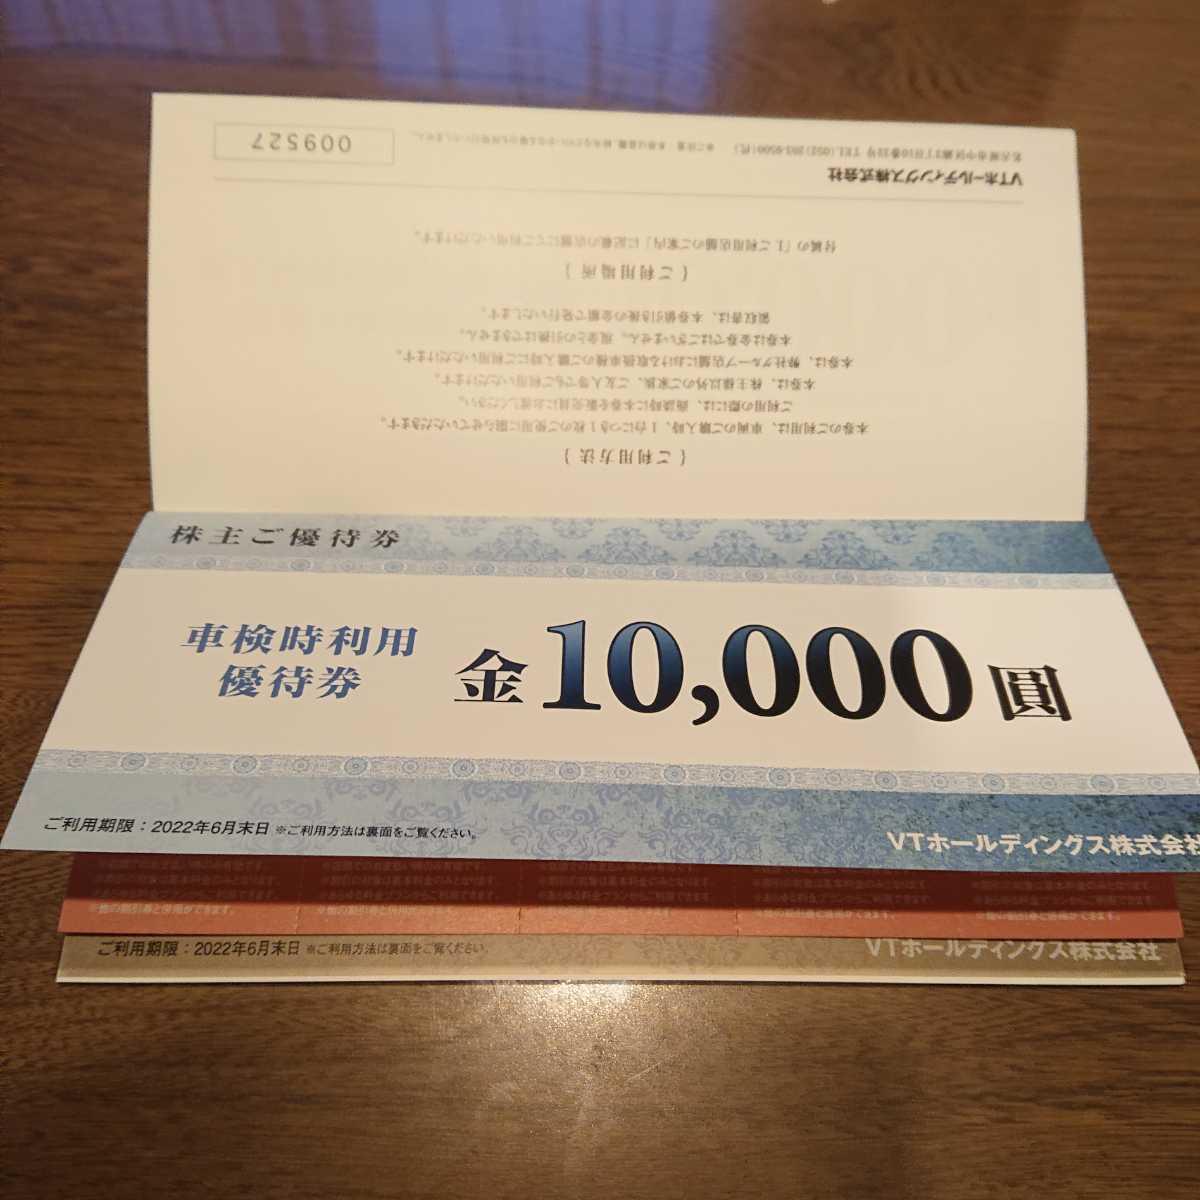 VTホールディングス株主優待 KeePer LABO20%割引券など (1冊:未使用)_画像3